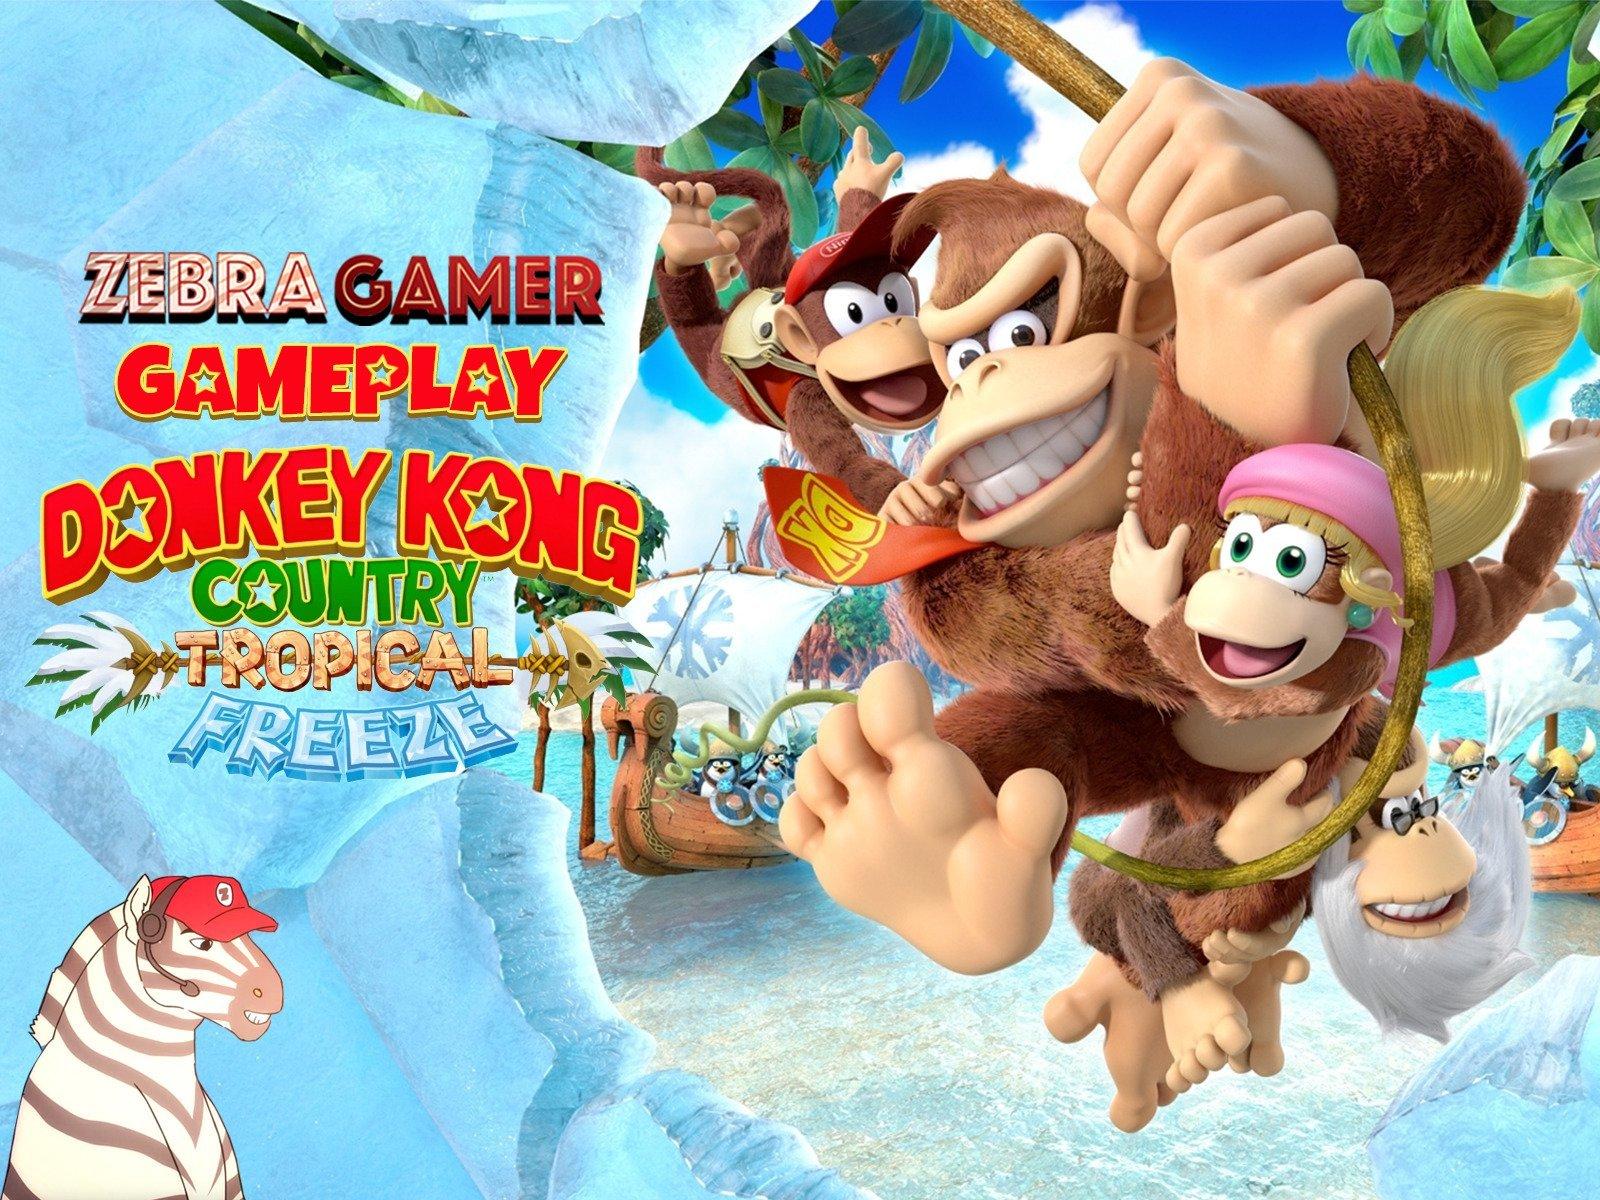 Clip: Donkey Kong Country Tropical Freeze Gameplay - Zebra Gamer - Season 1